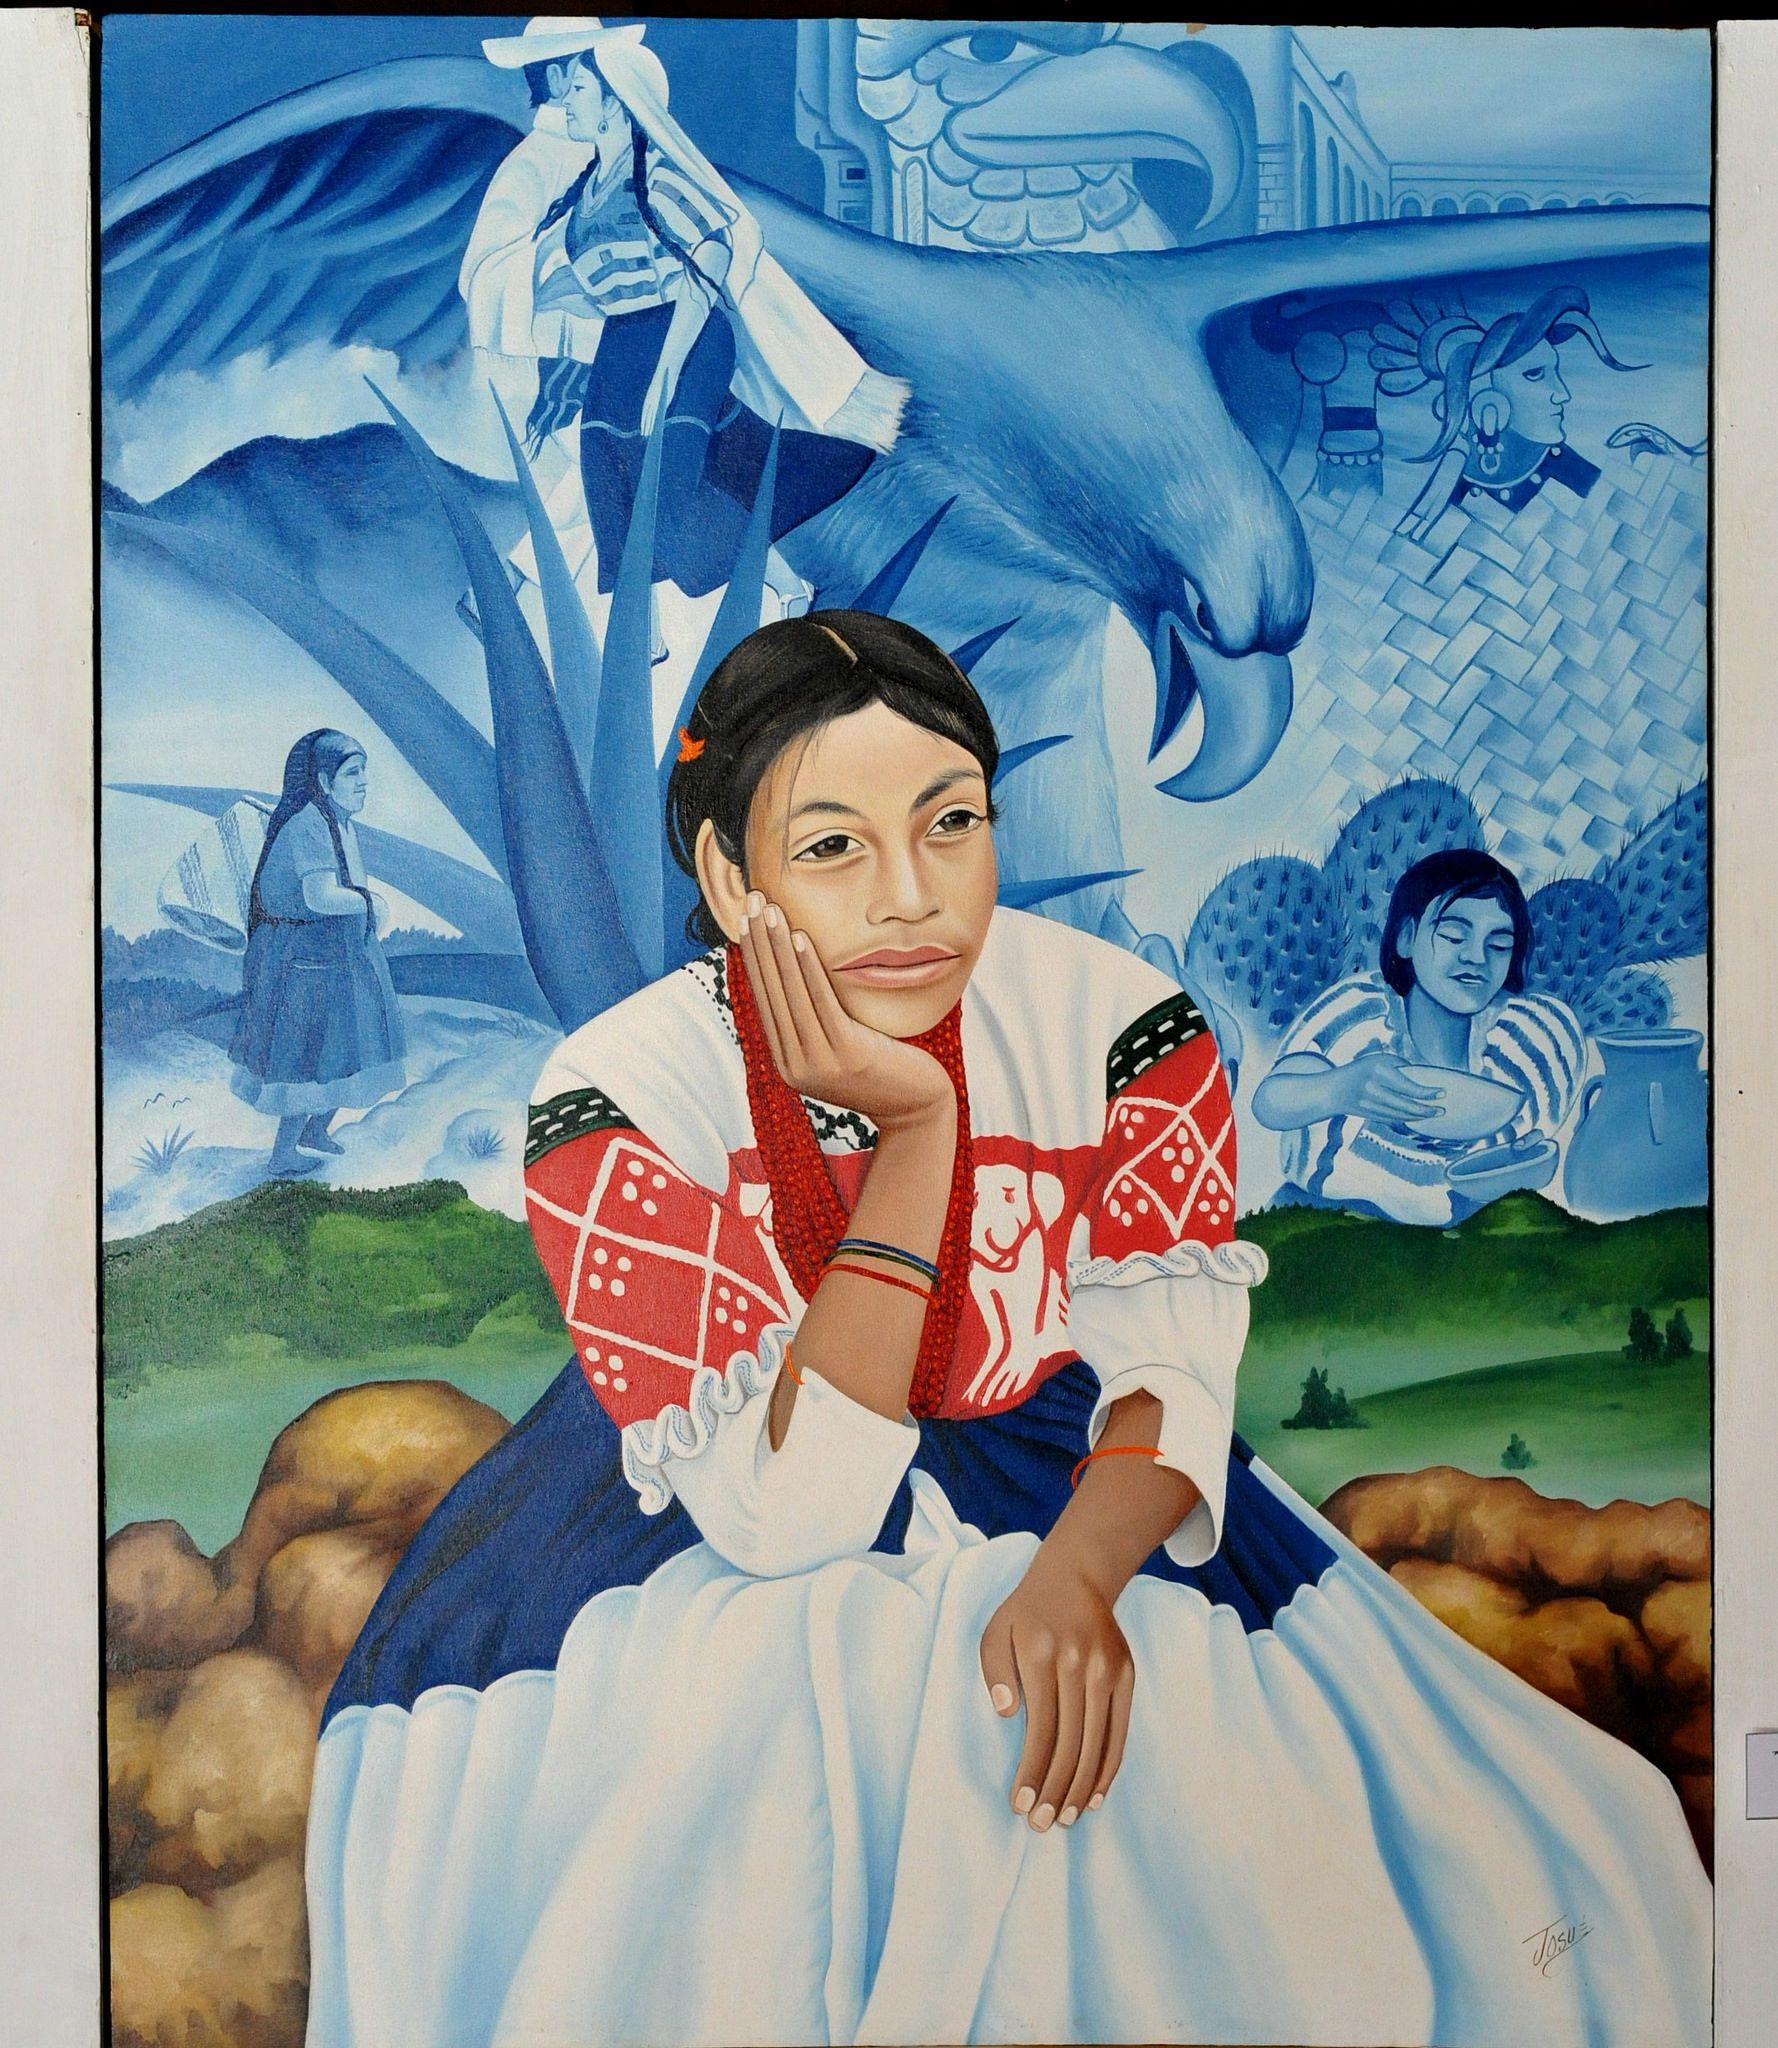 https://flic.kr/p/vSGcMa | Painting Mixtec Woman Oaxaca | Lovely painting of a young Mixtec woman from San Pablo Tijaltepec, Oaxaca, Mexico by Mixtec artist Josue Lopez of Chalcatongo, Oaxaca.  Exhibited at the Museo Estatal de Arte Popular Oaxaqueno